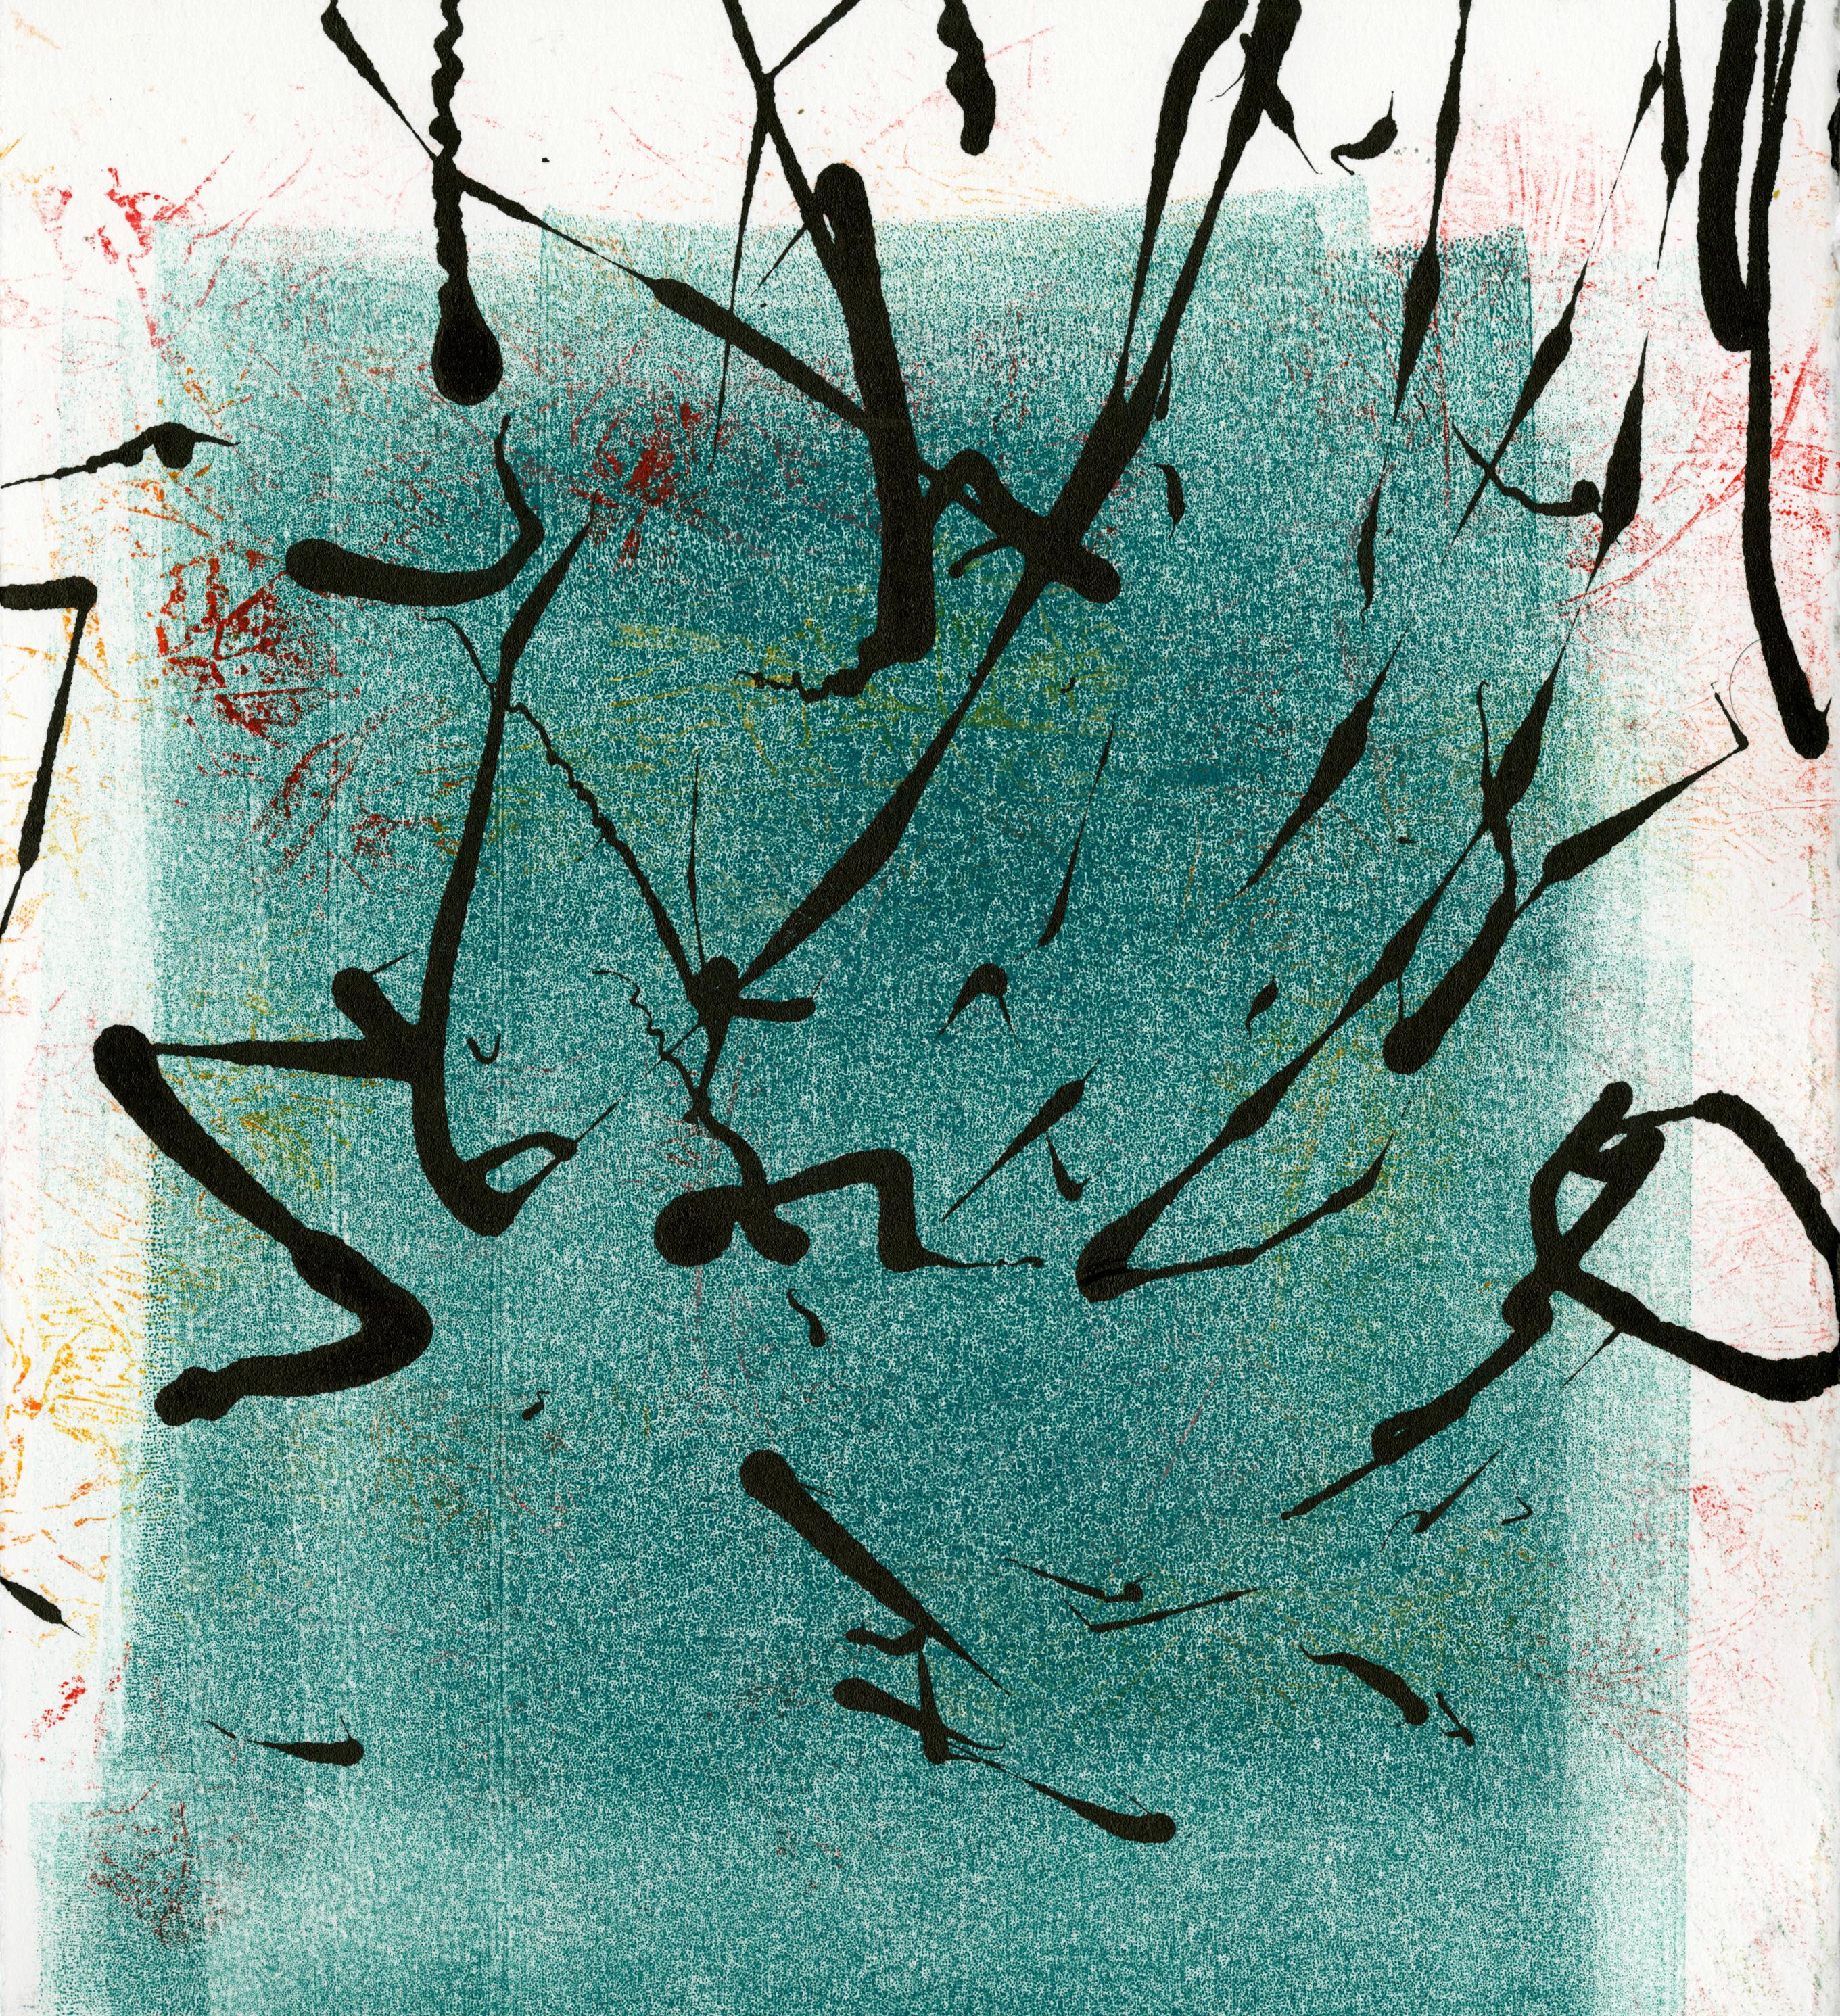 Untitled - Arnold Barretto, Student, SUNY Plattsburgh